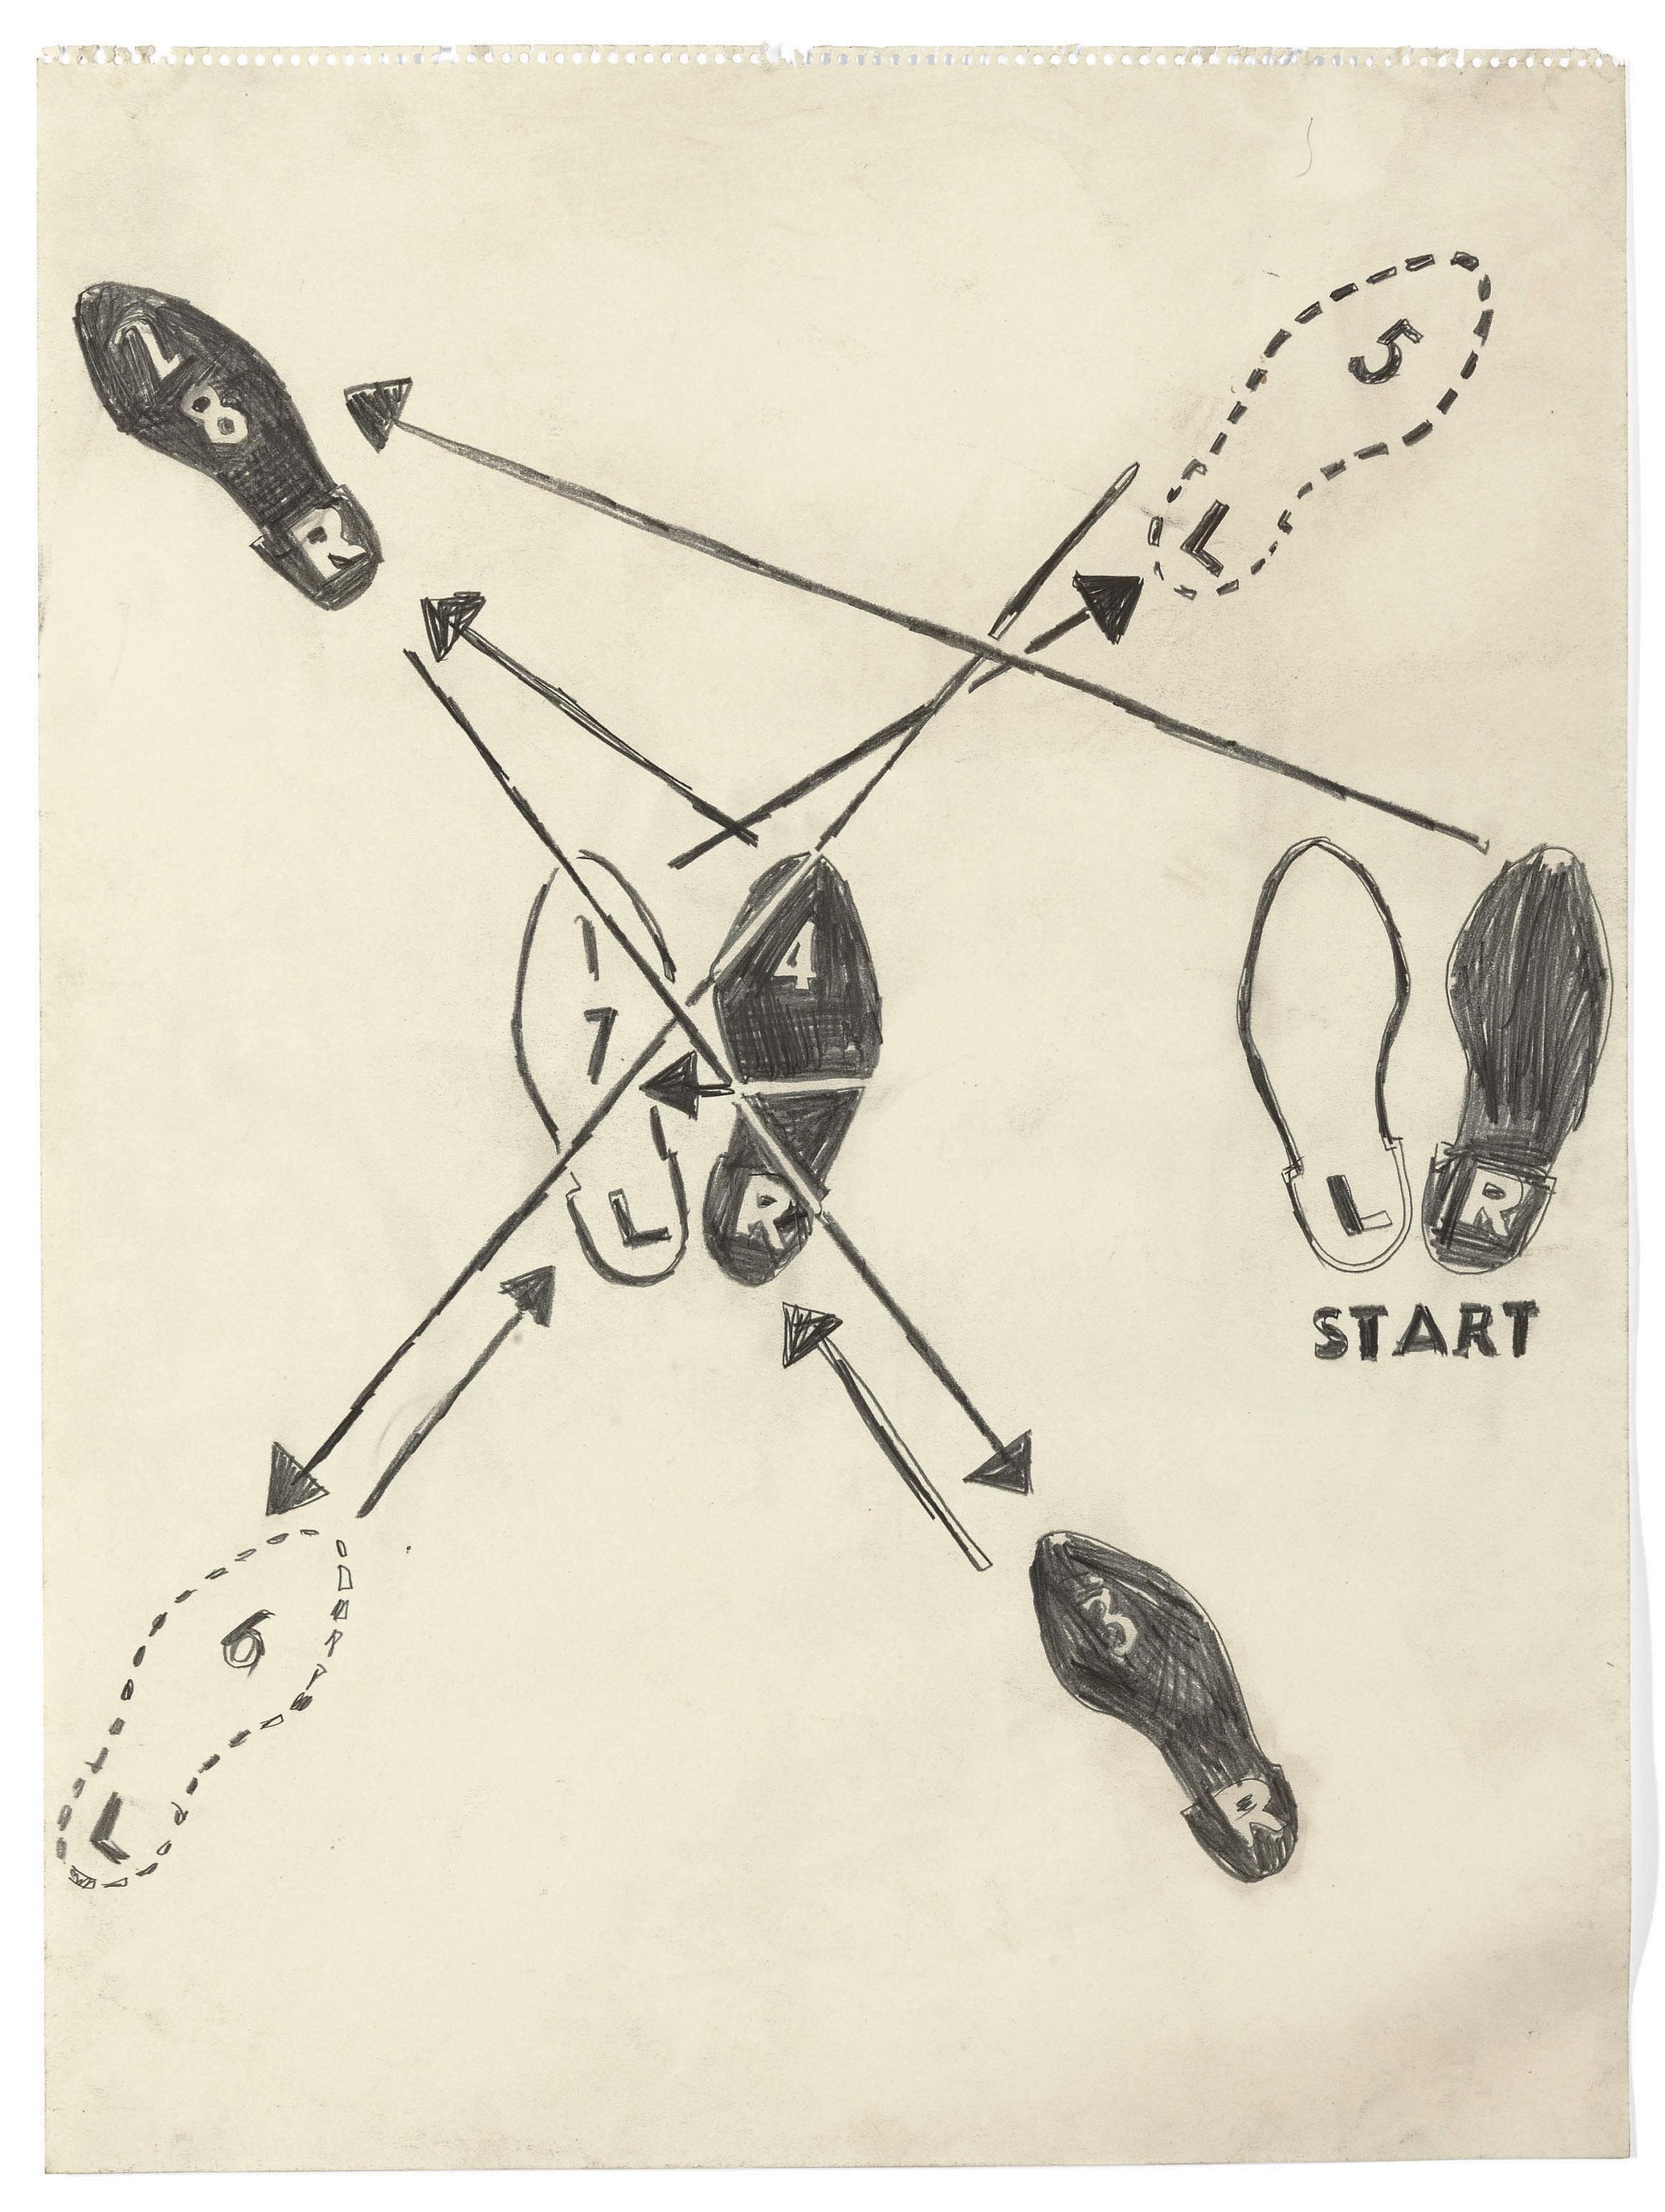 dance diagram andy warhol andy warhol  1928 1987  dance diagram 20th century  drawings  andy warhol  1928 1987  dance diagram